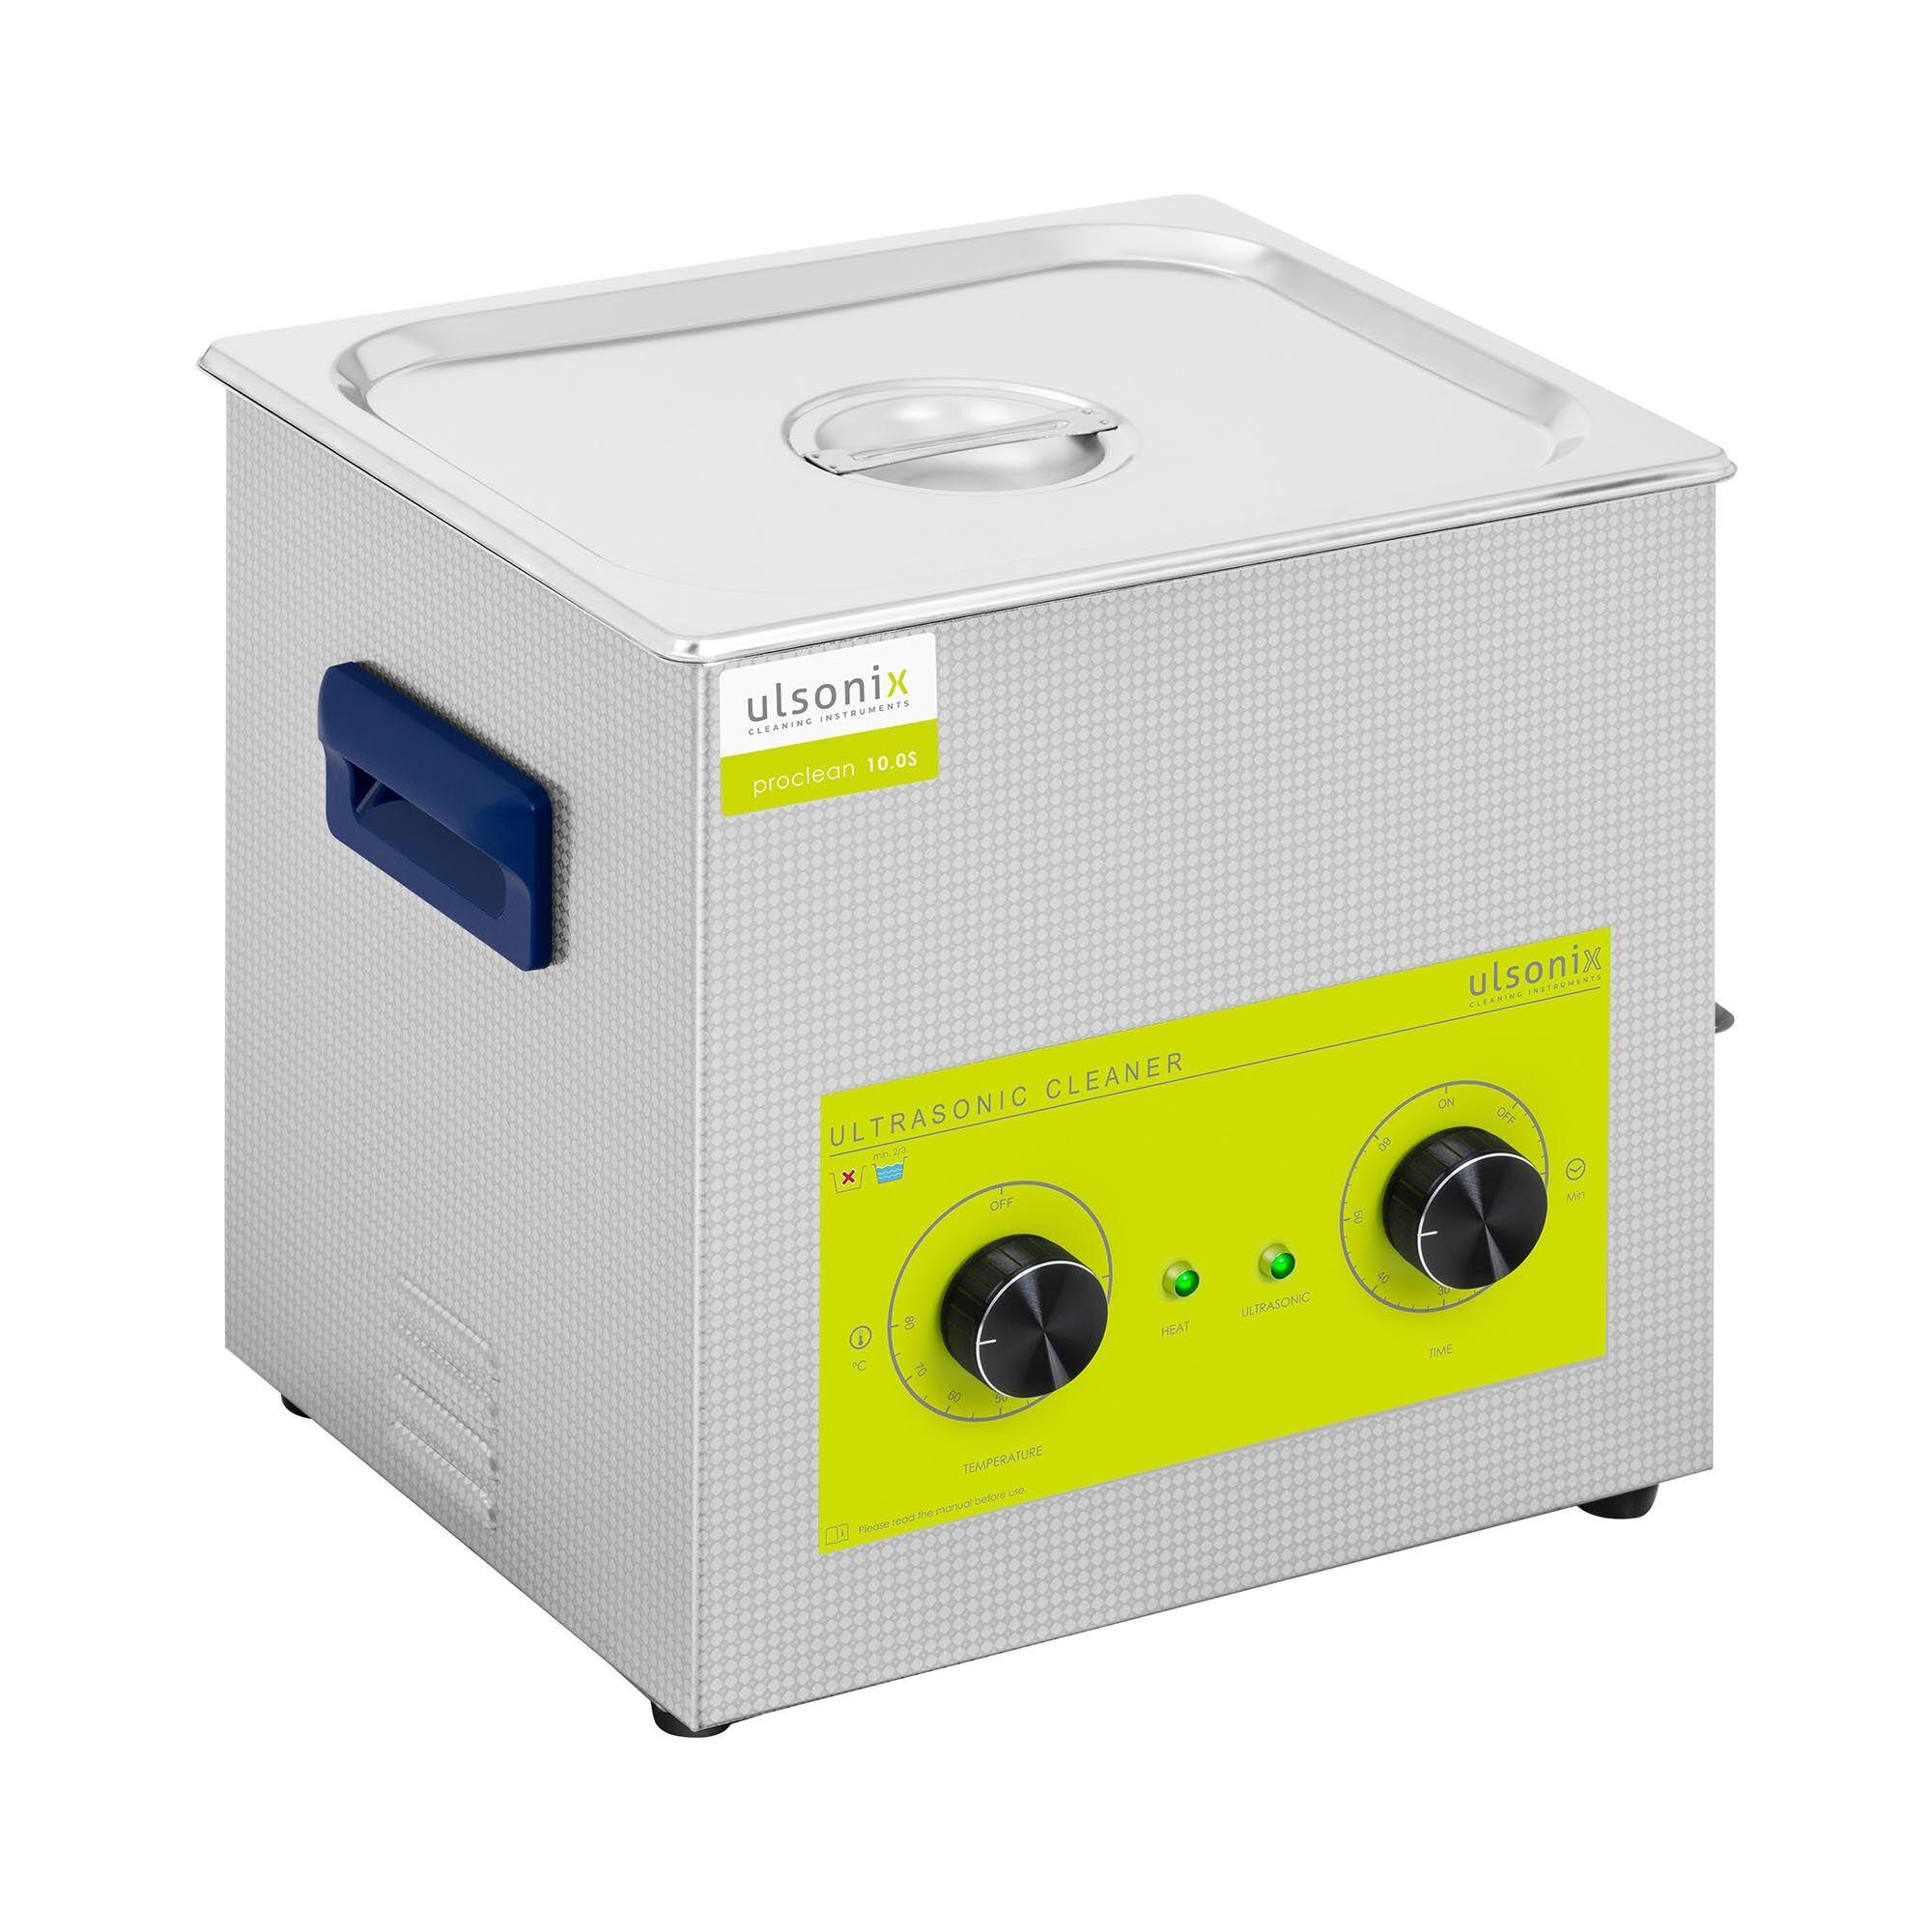 ulsonix Nettoyeur à ultrasons - 10 litres - 240 watts PROCLEAN 10.0MS